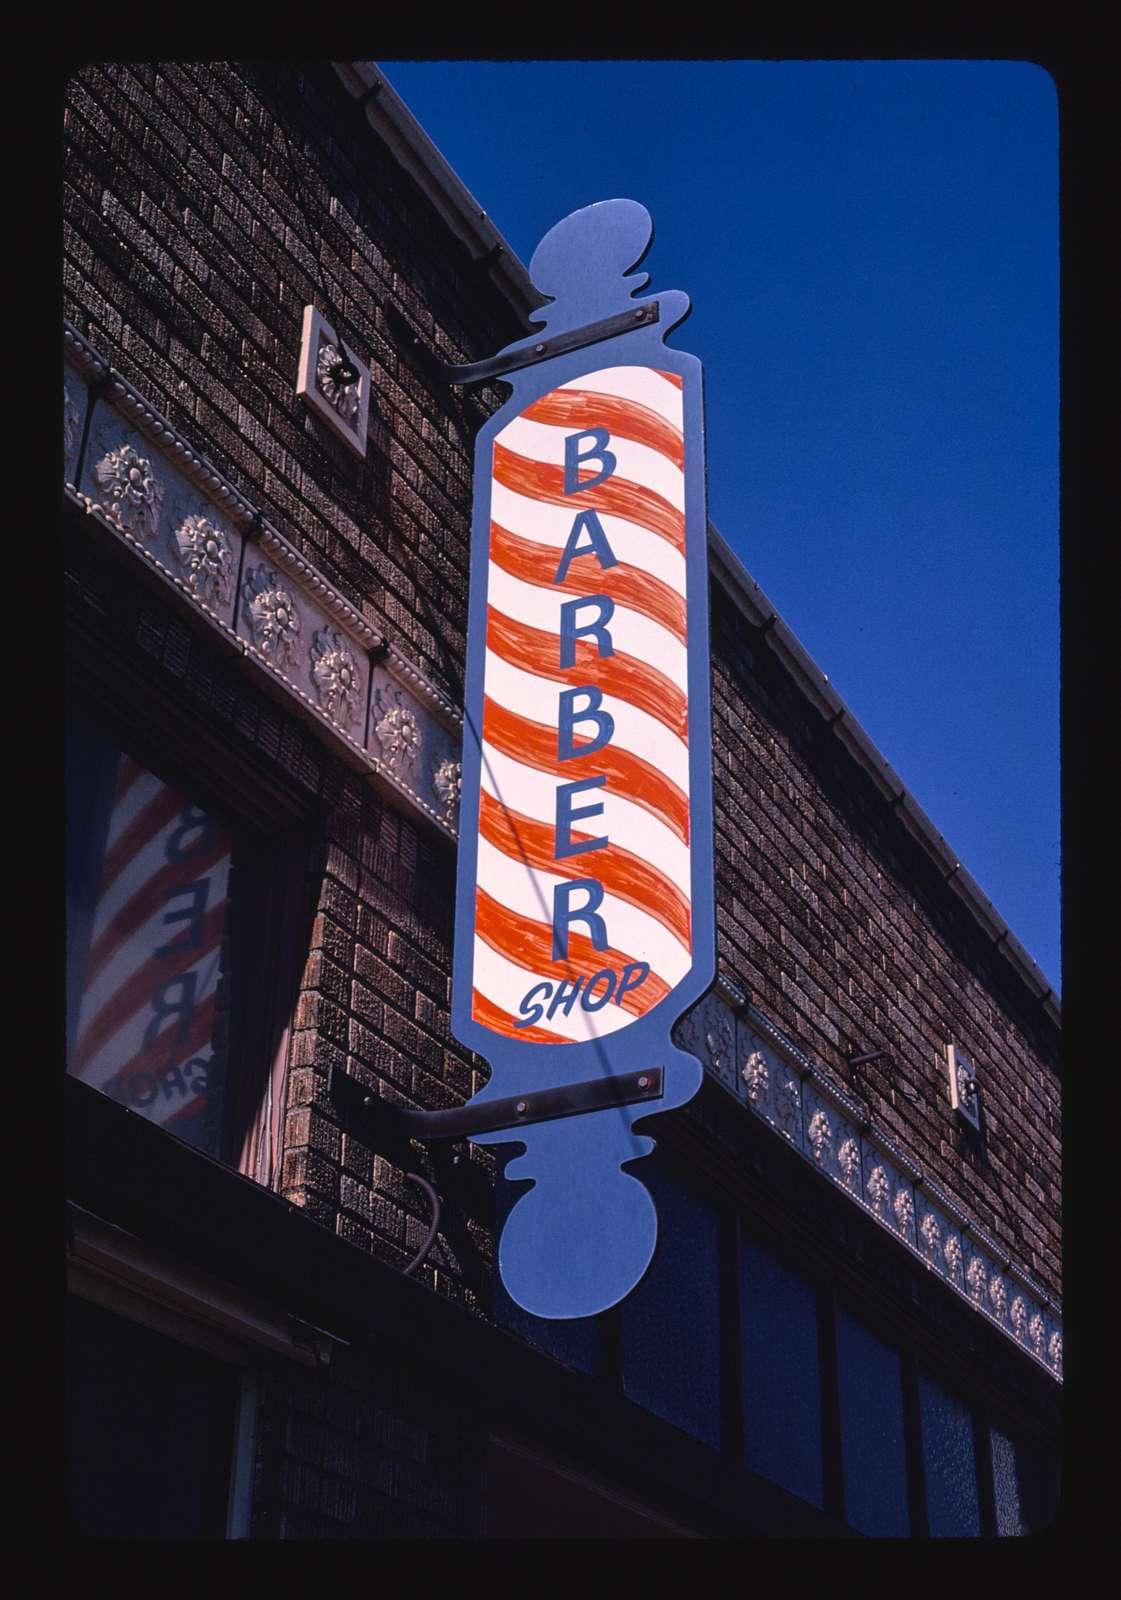 Barber sign, Commercial Avenue, Anacortes, Washington